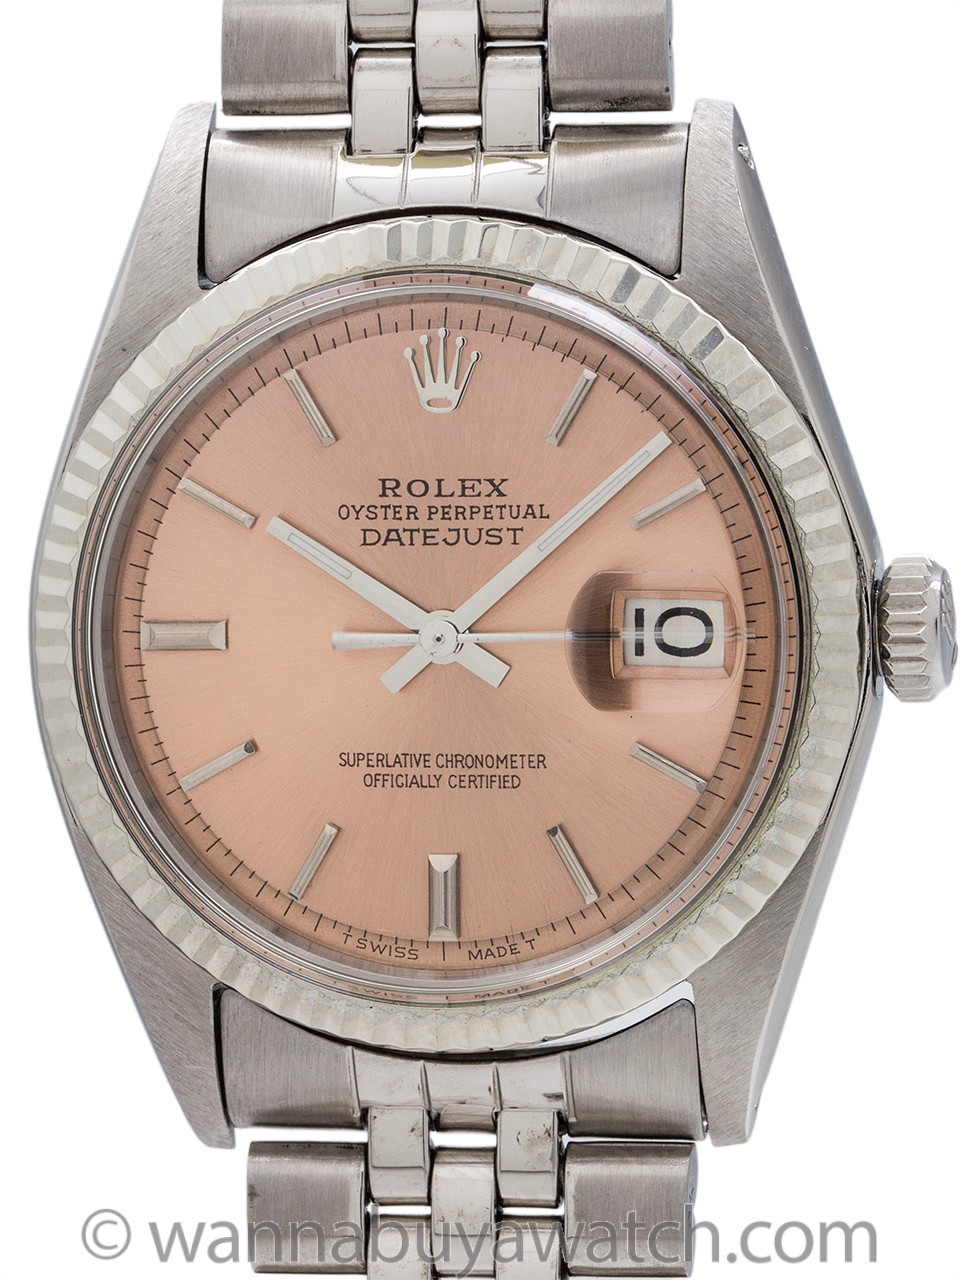 Rolex Datejust ref 1601 SS/14K WG Salmon Pie Pan Dial circa 1968